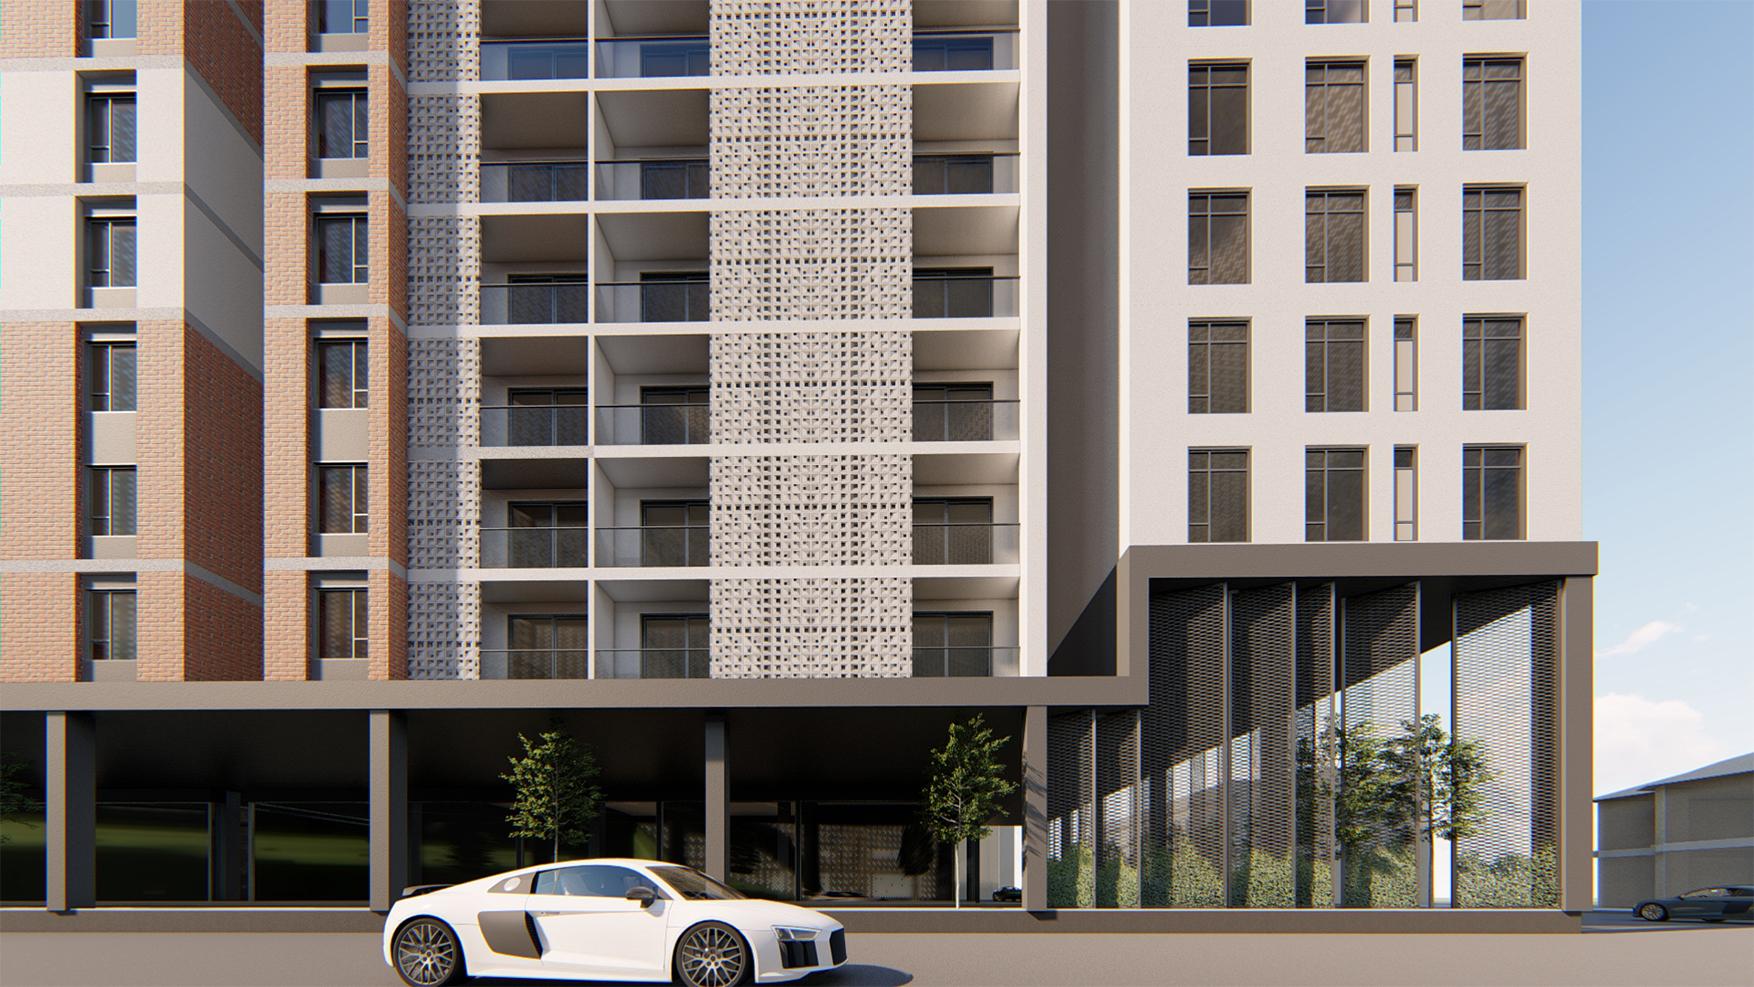 Taiping Grand Hotel Conceptual Design